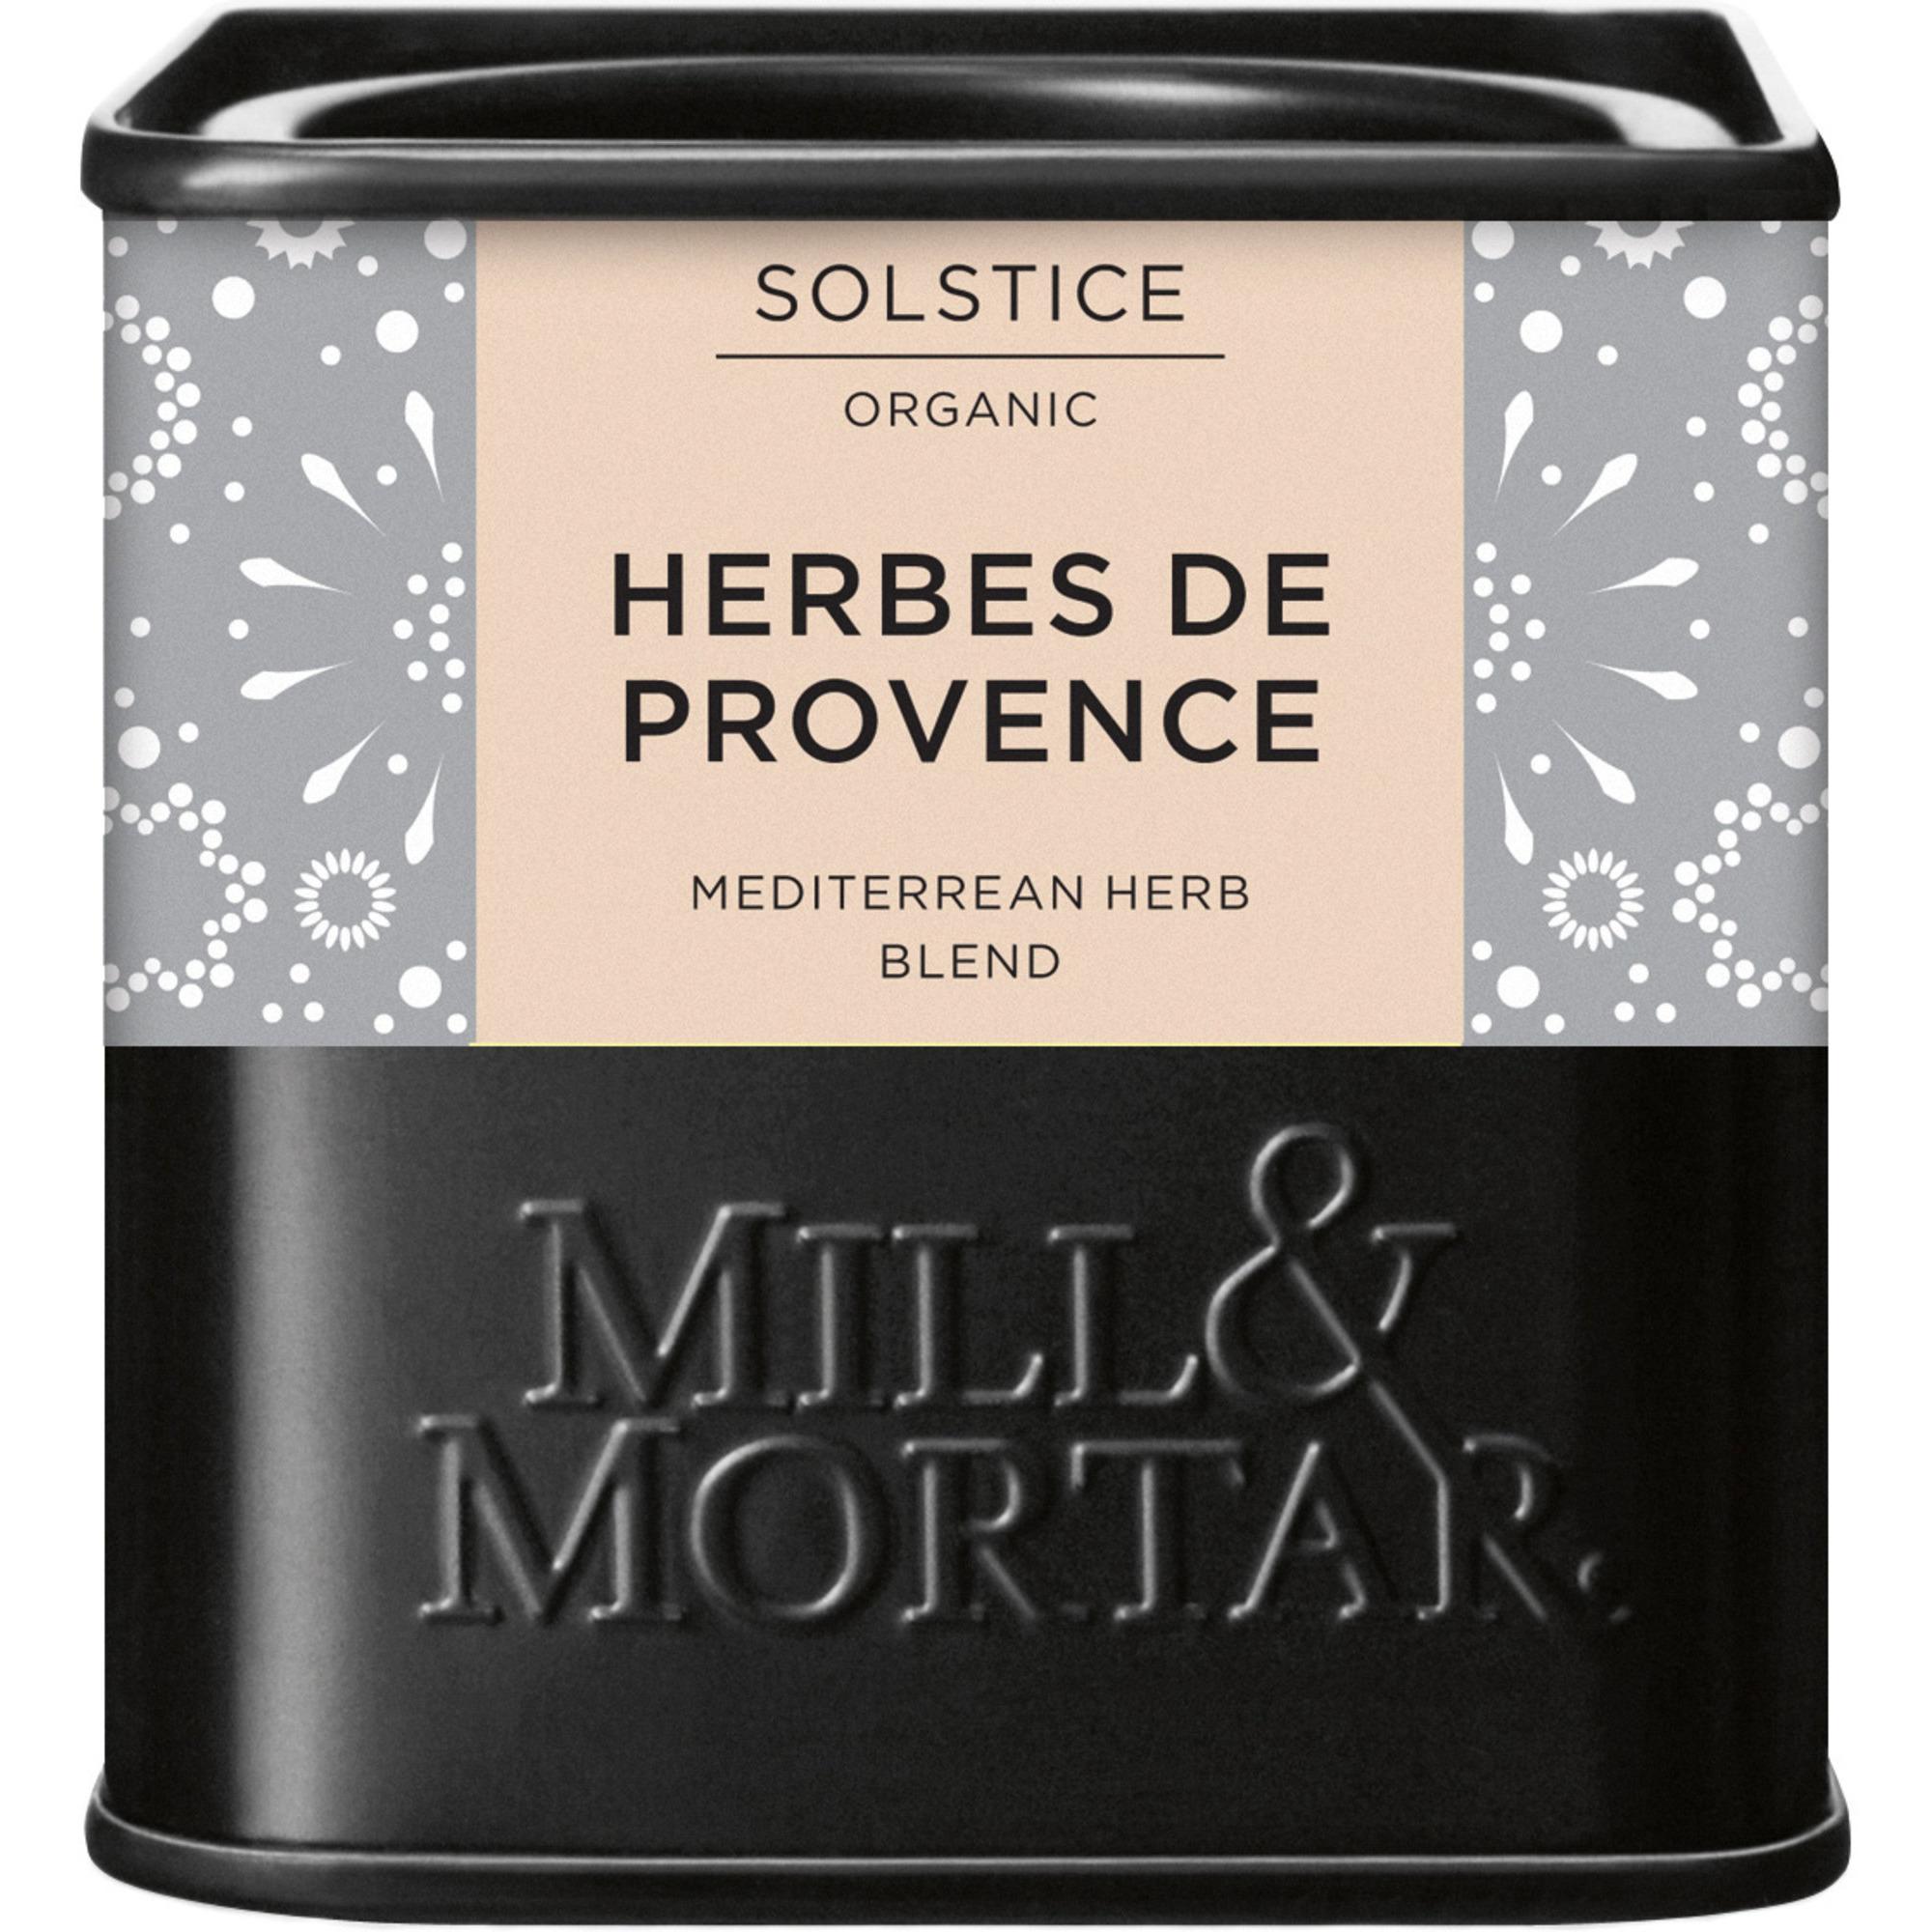 Mill & Mortar Herbes de Provence 25 g